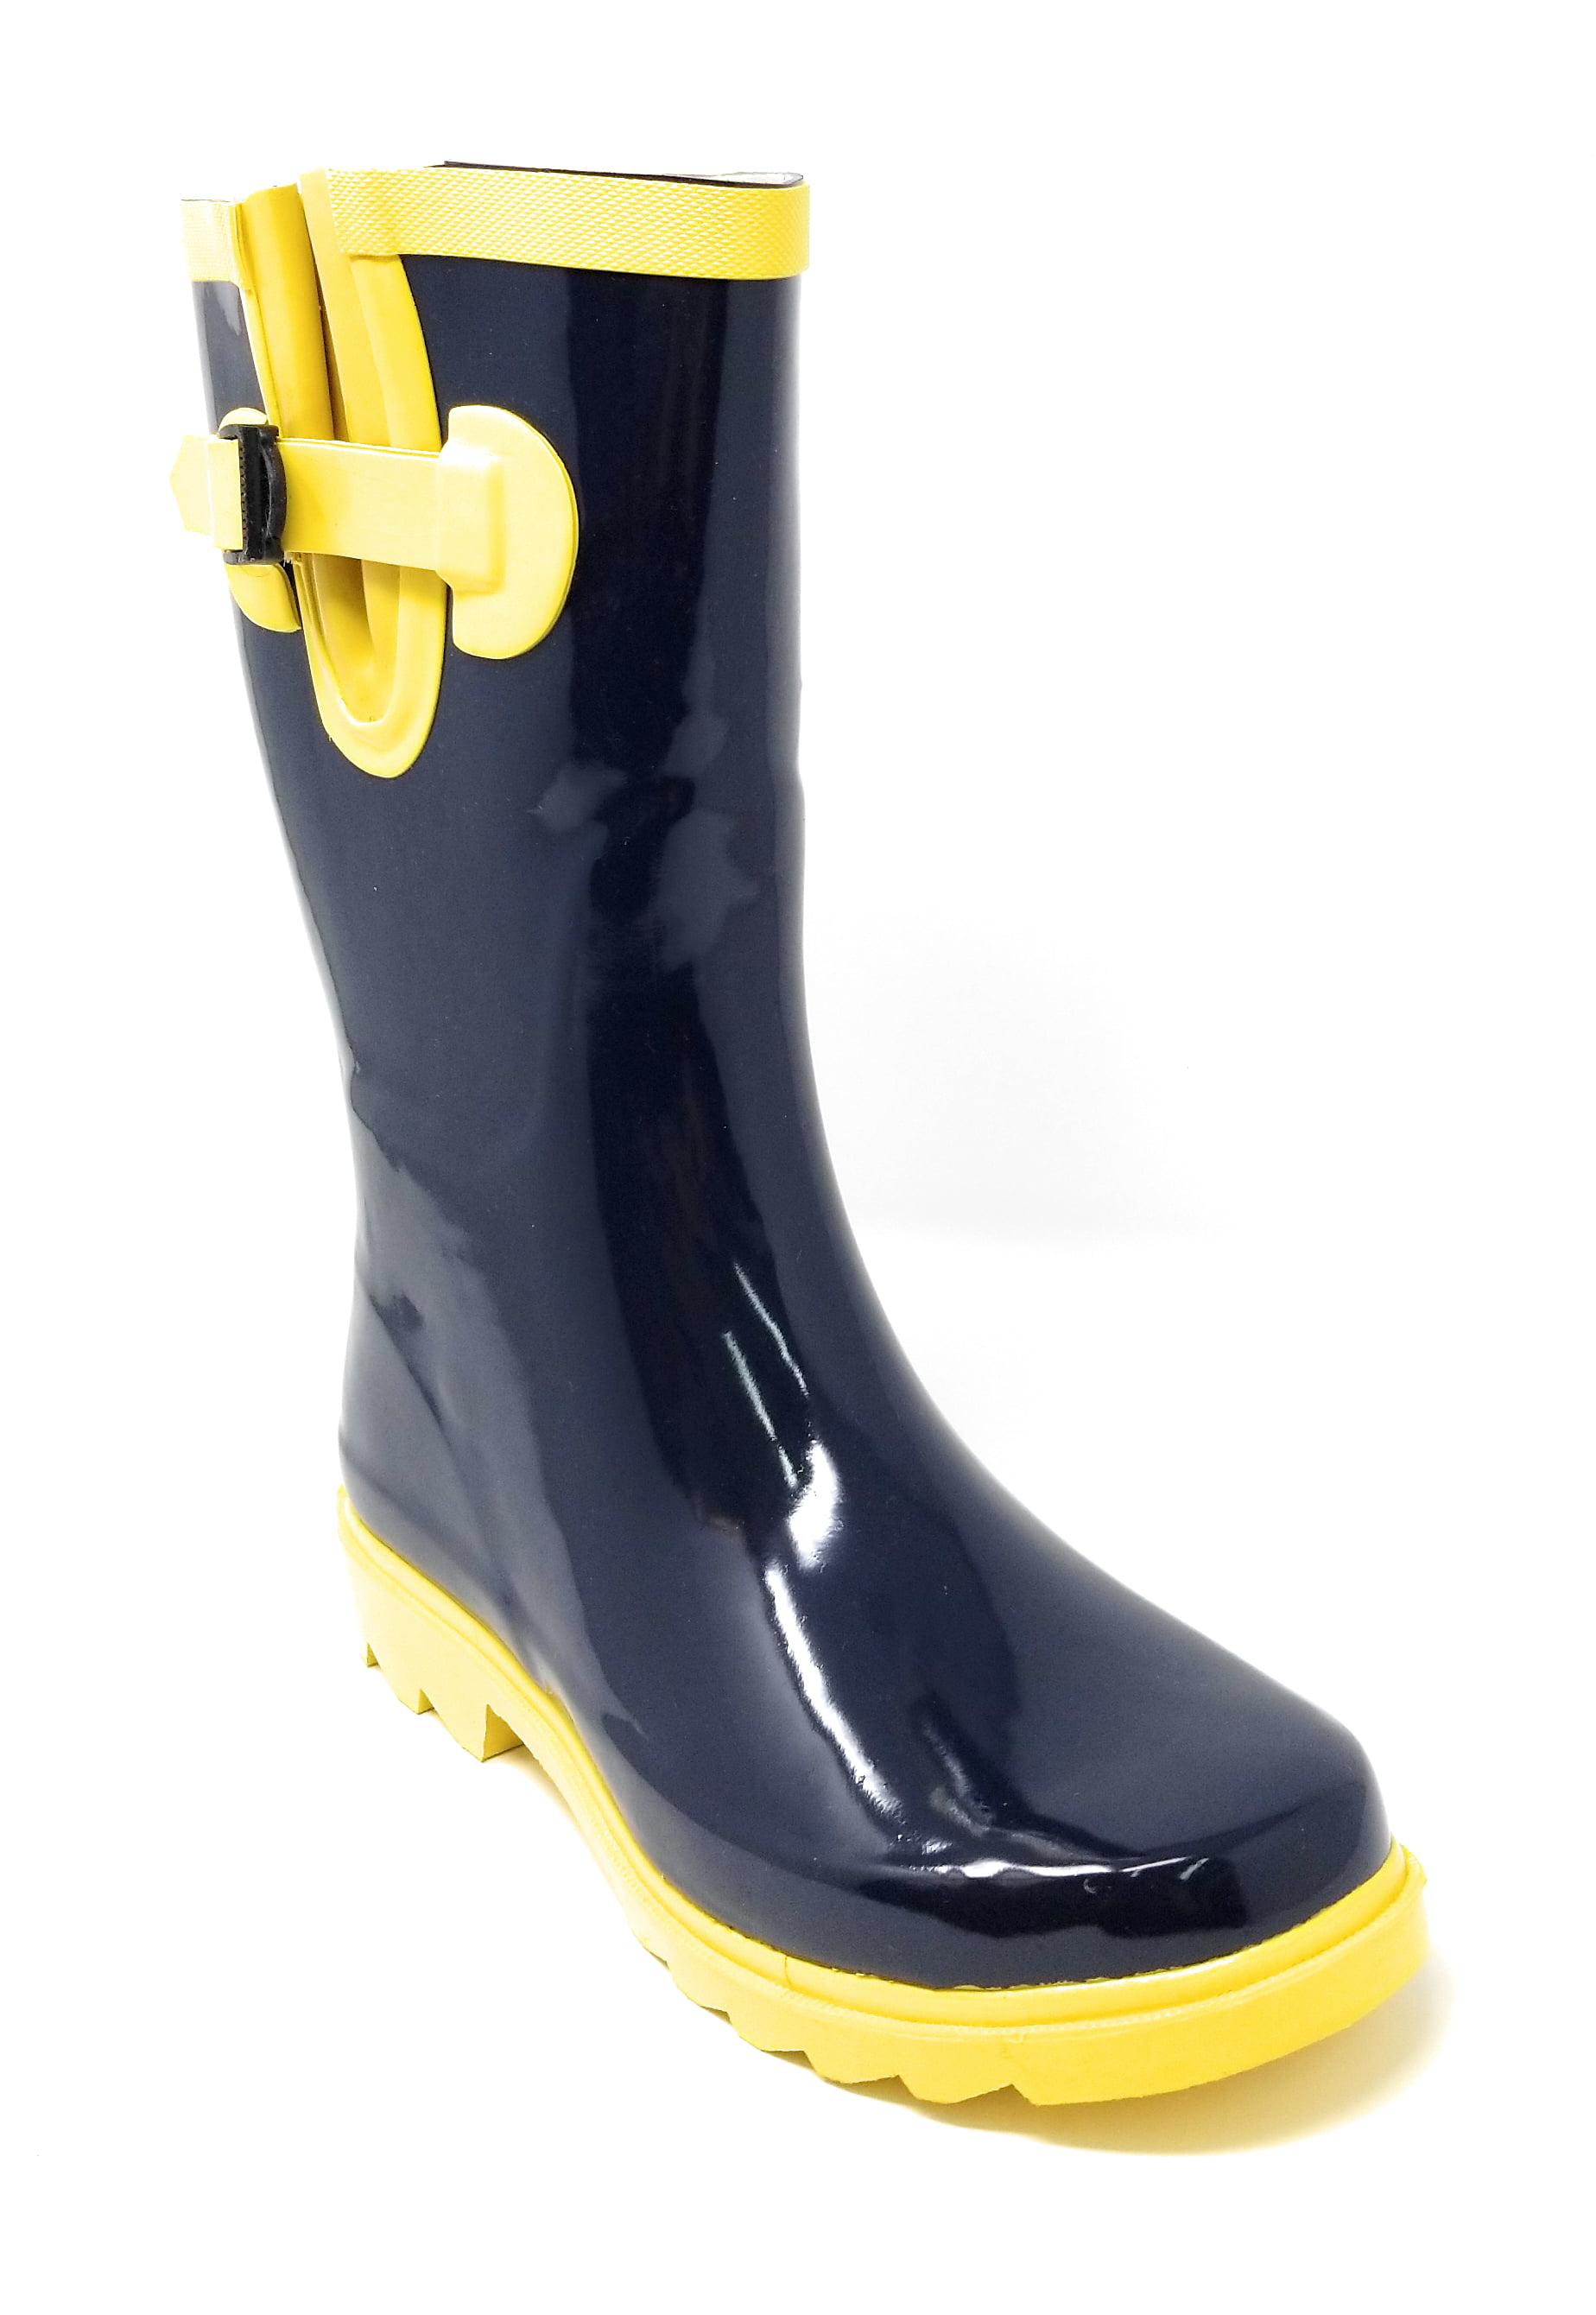 "Women Classic Mid-Calf 11"" Two-Tone Navy & Yellow Wellies Waterproof Rubber Rain Boots Wellies Yellow 70b03f"